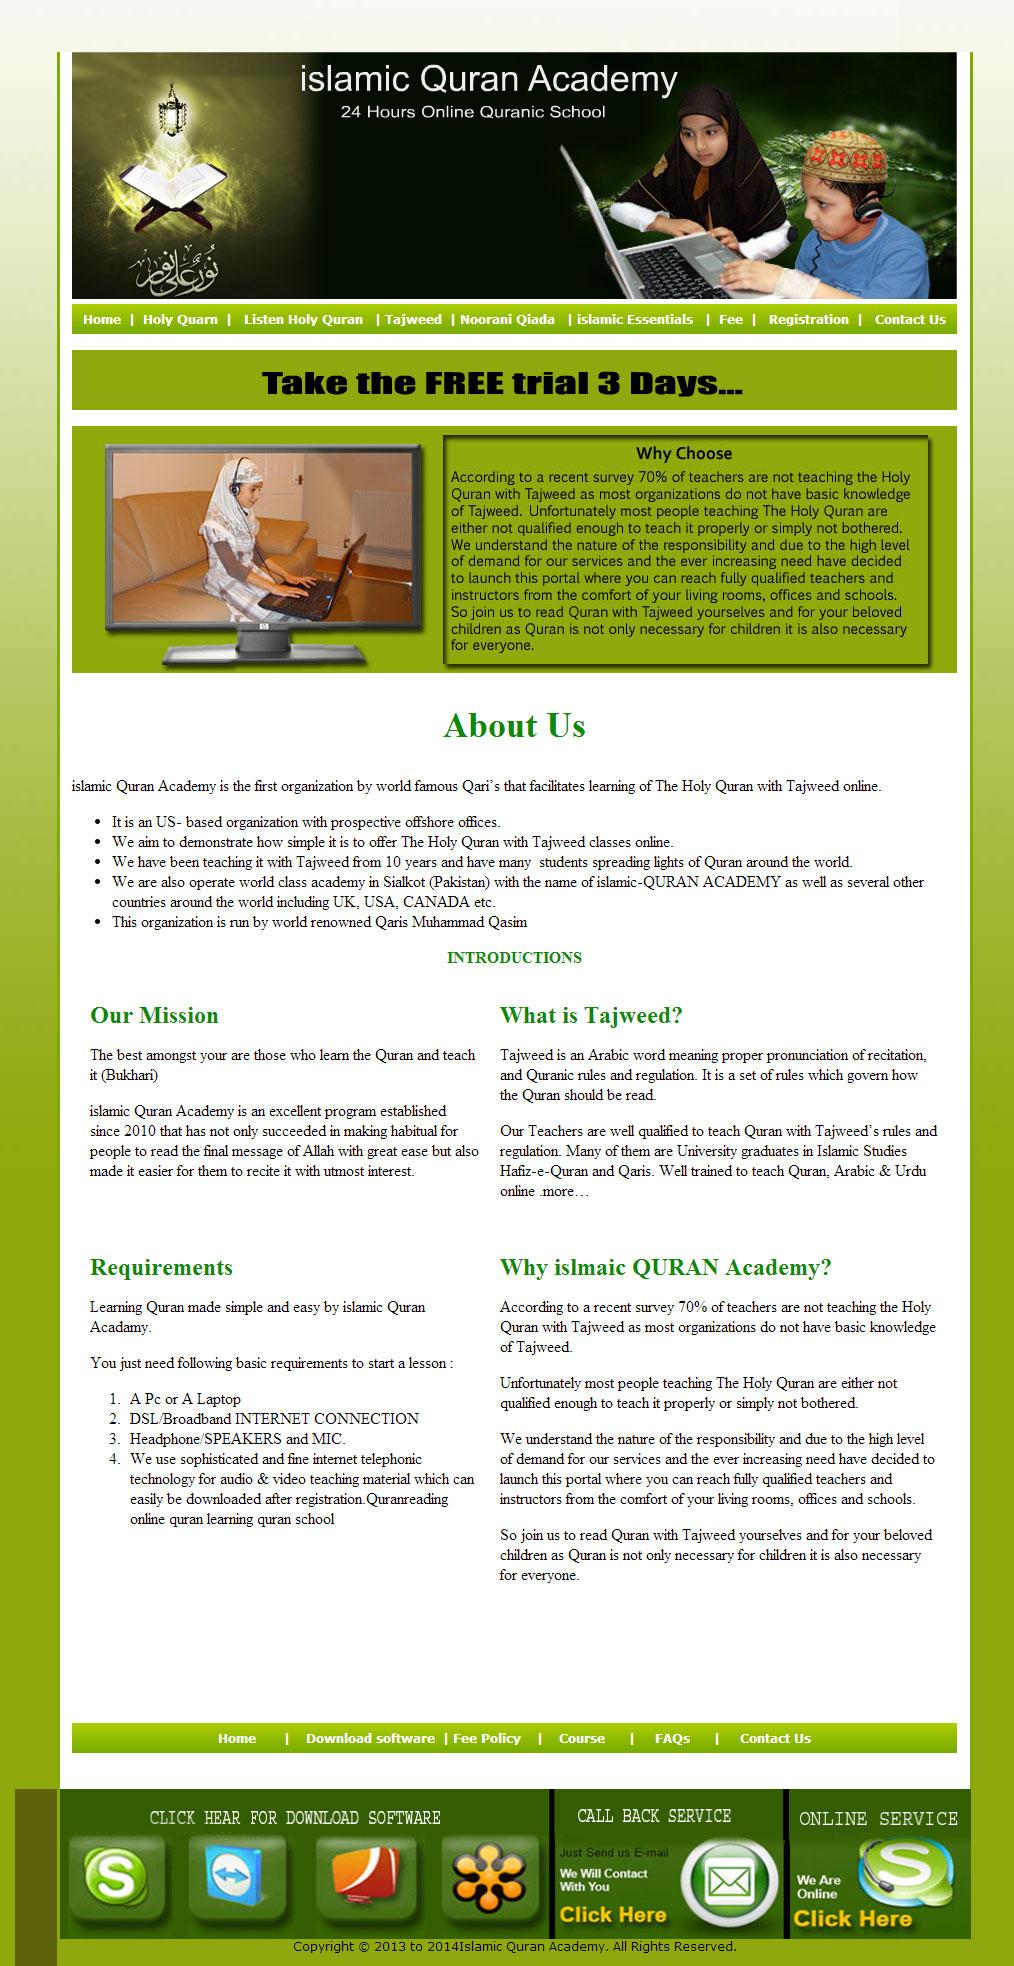 Islamic Quran Academy